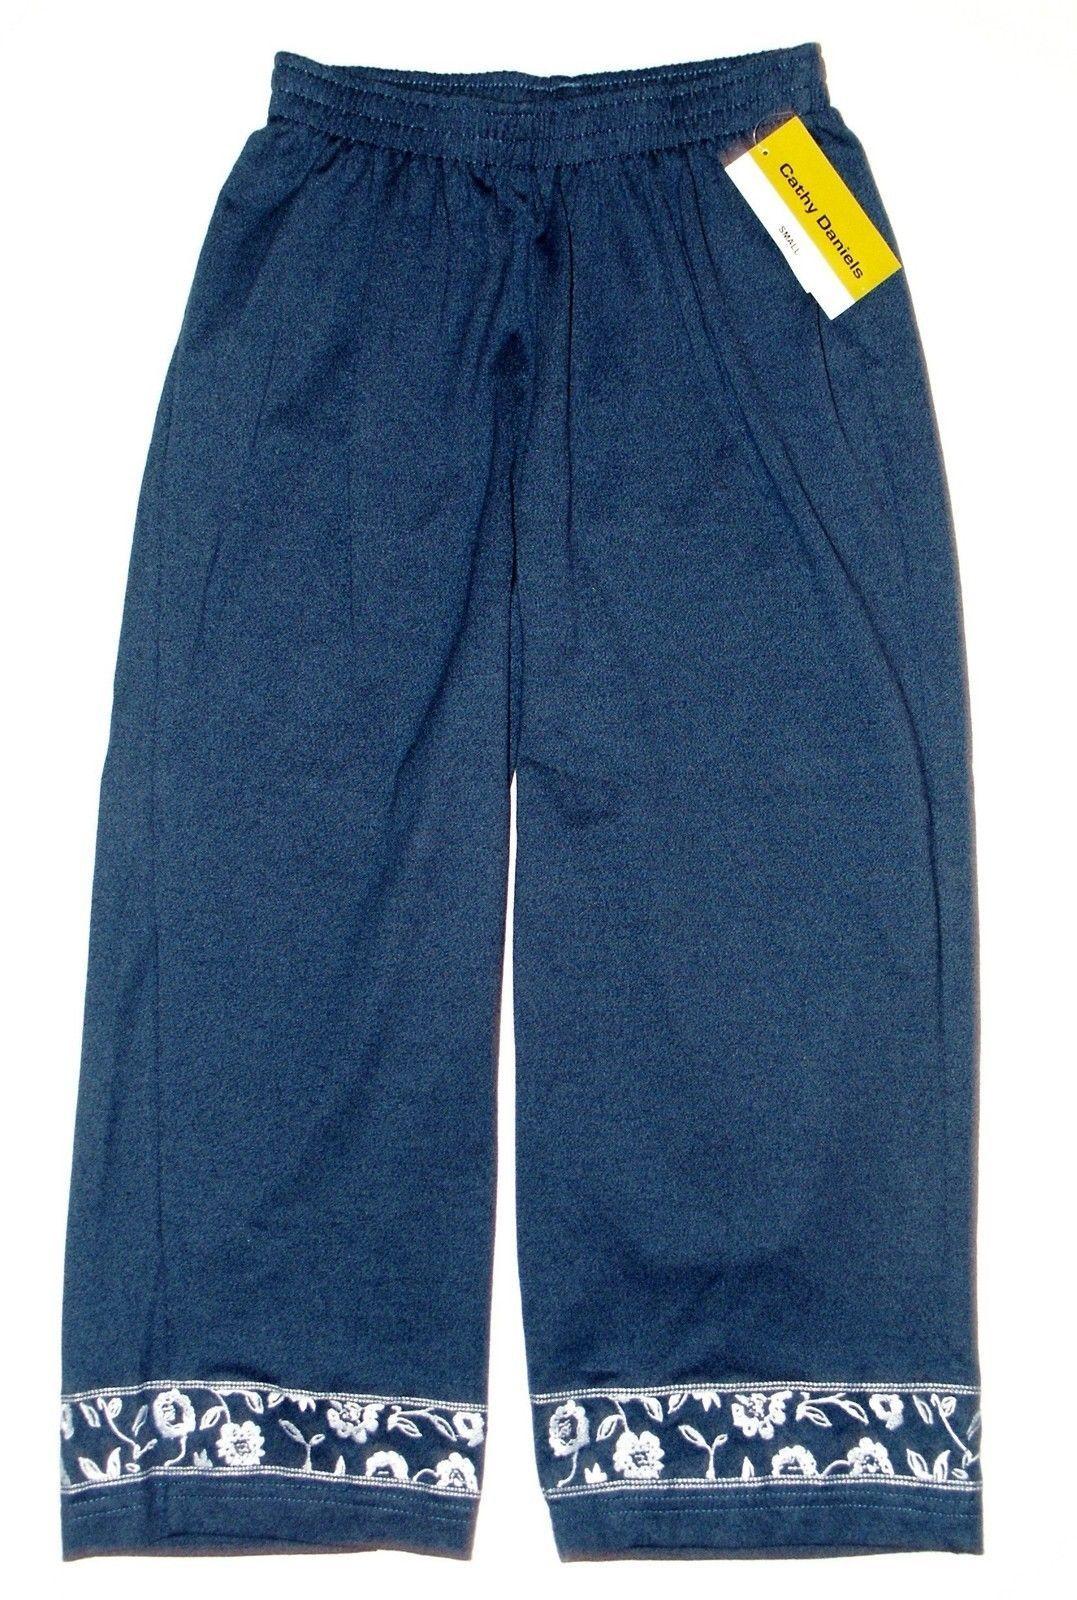 19c2701116c4c6 Cathy Daniels NEW Denim Blue Embroidered Legs Capris Pants Womens Size S  $42 - $21.00